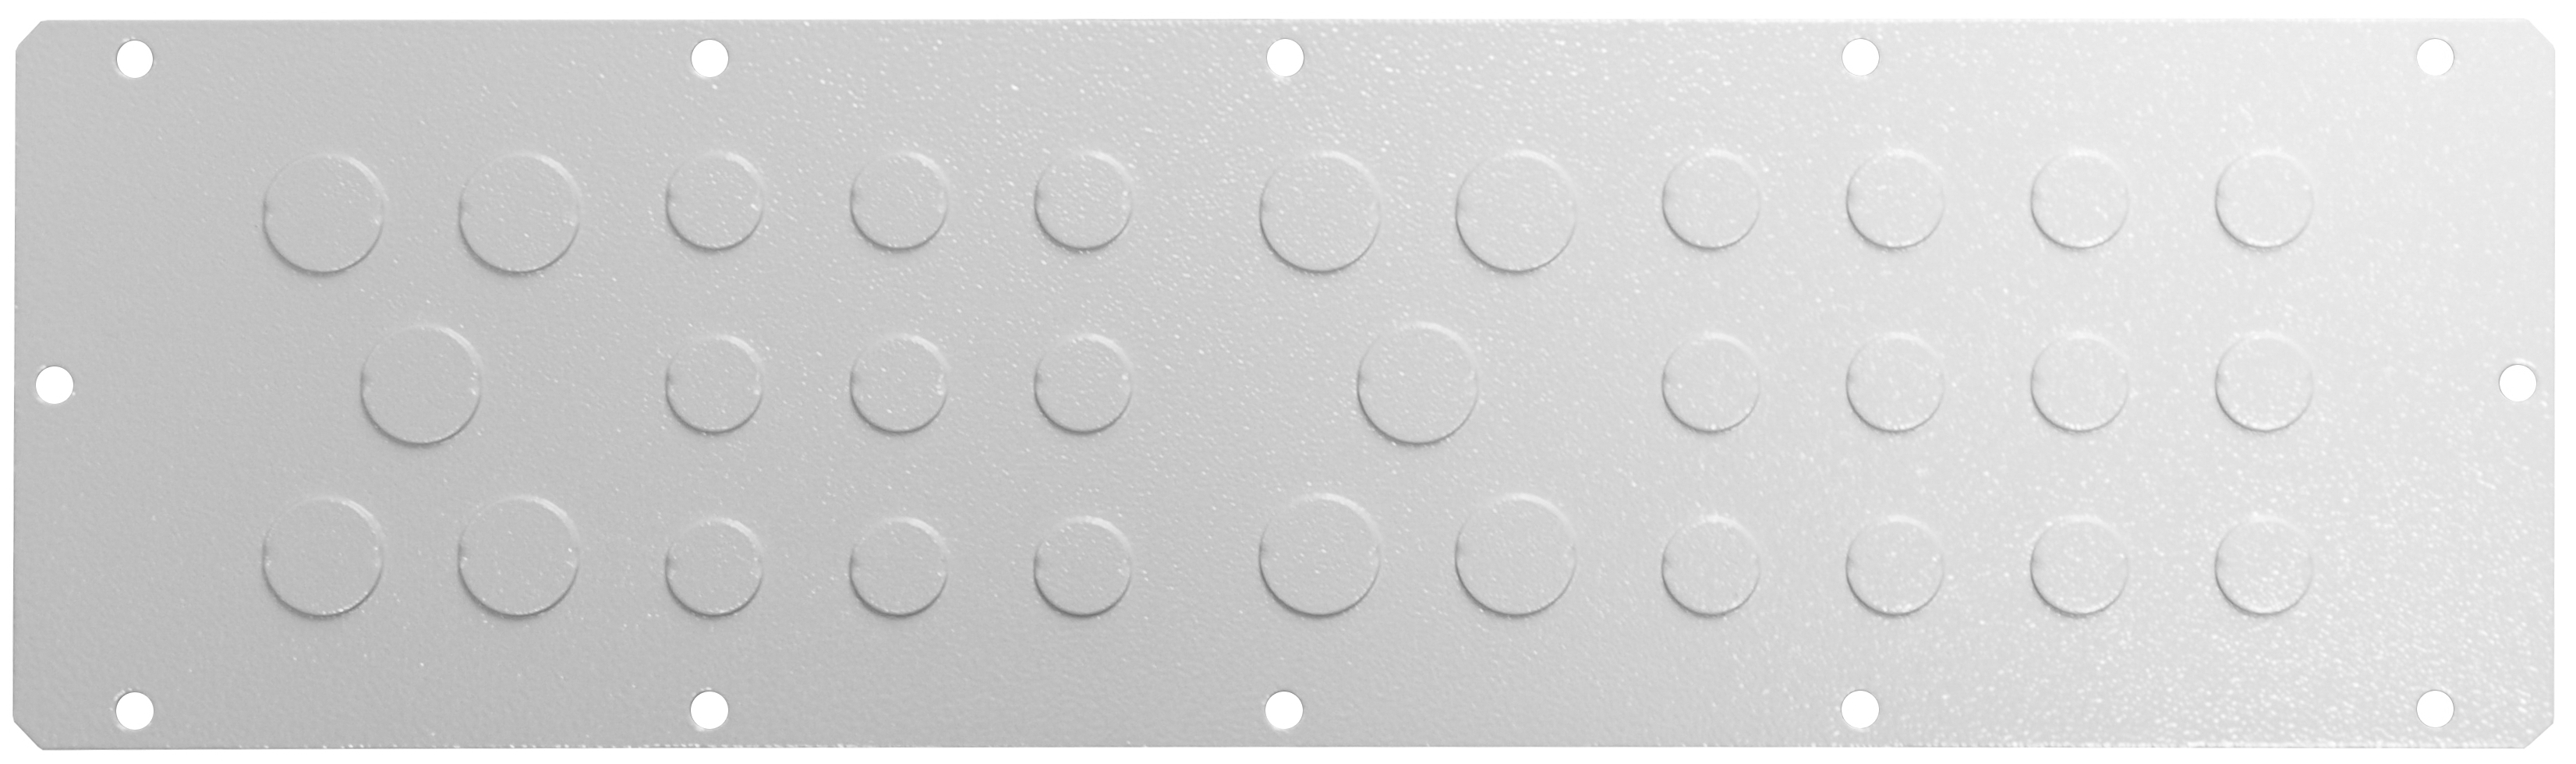 1 Stk Flansch 410x96, Ausprägung 21xM16, 10xM20 WSFA0032--